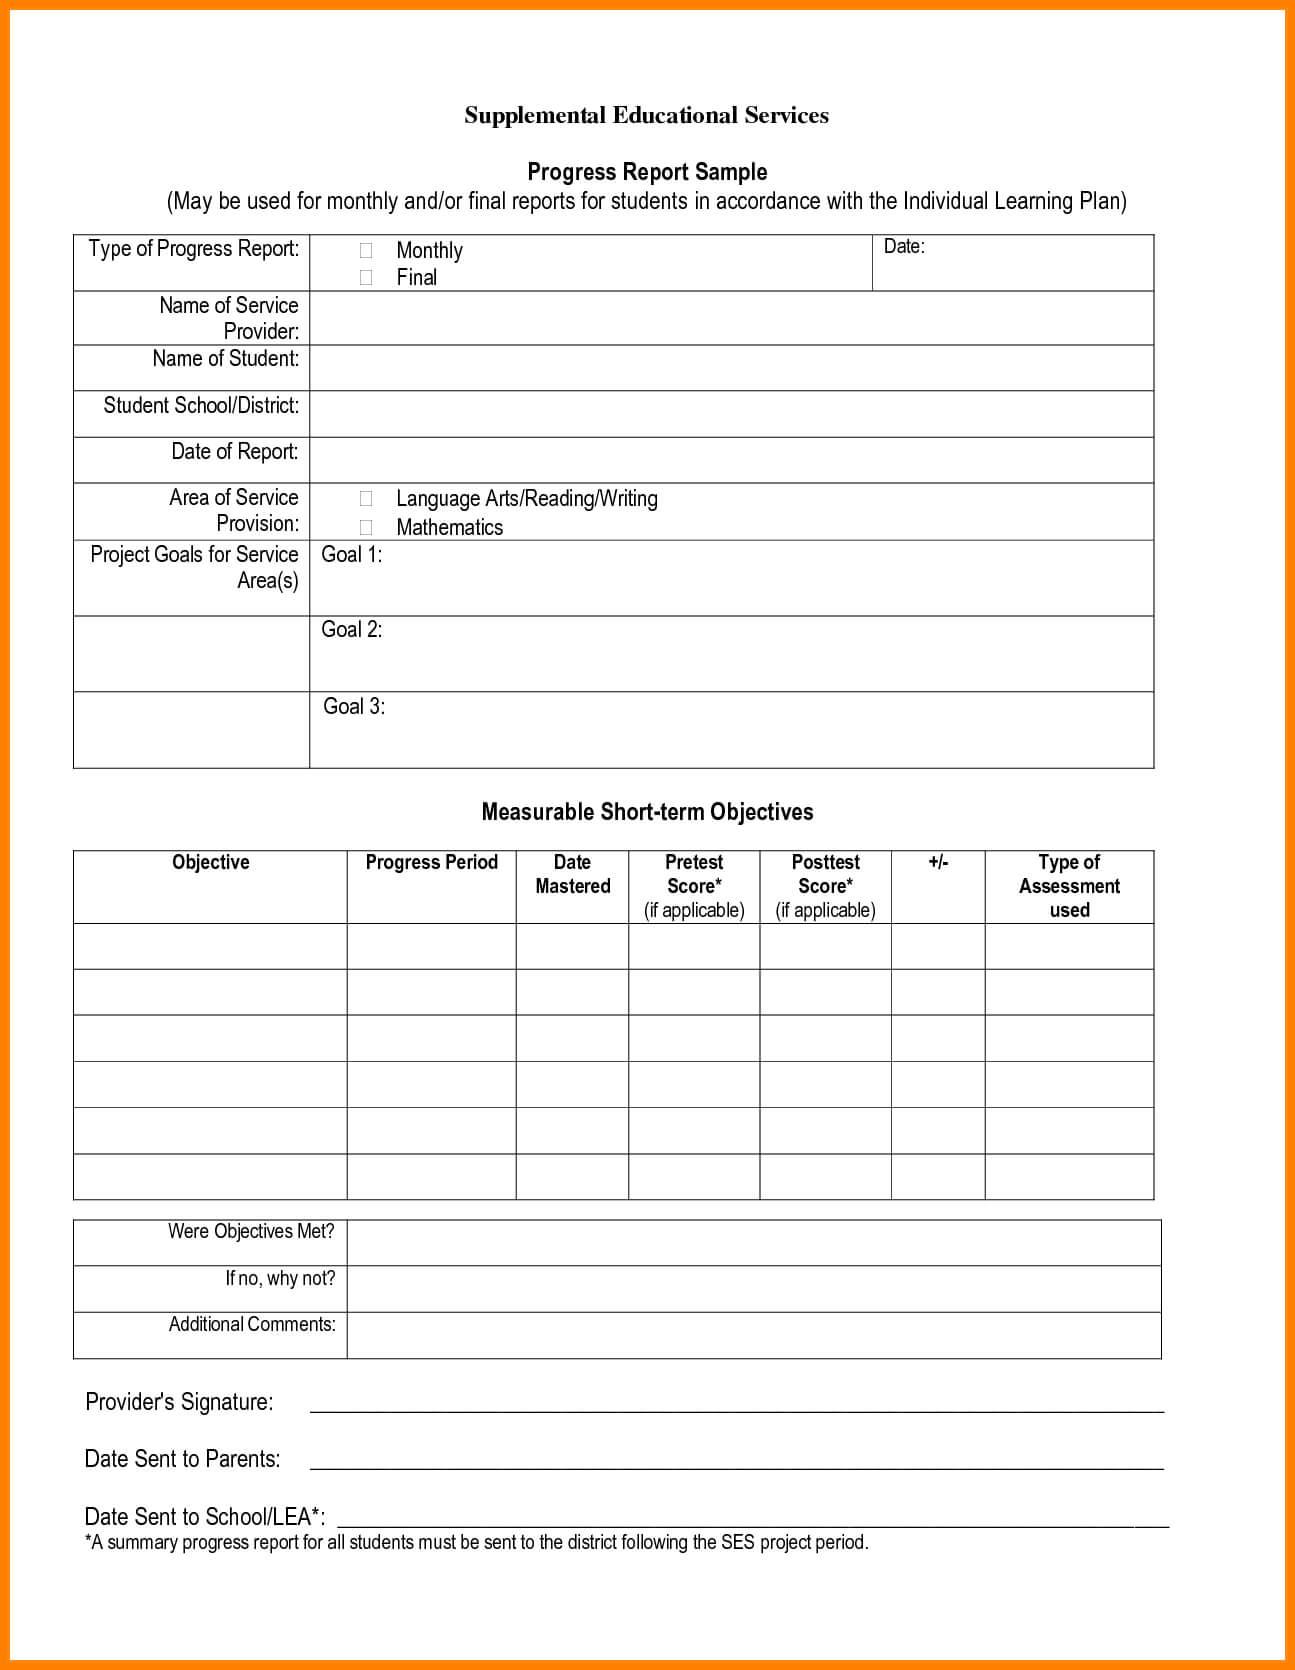 003 Template Ideas Student Progress Beautiful Report Card For High School Progress Report Template